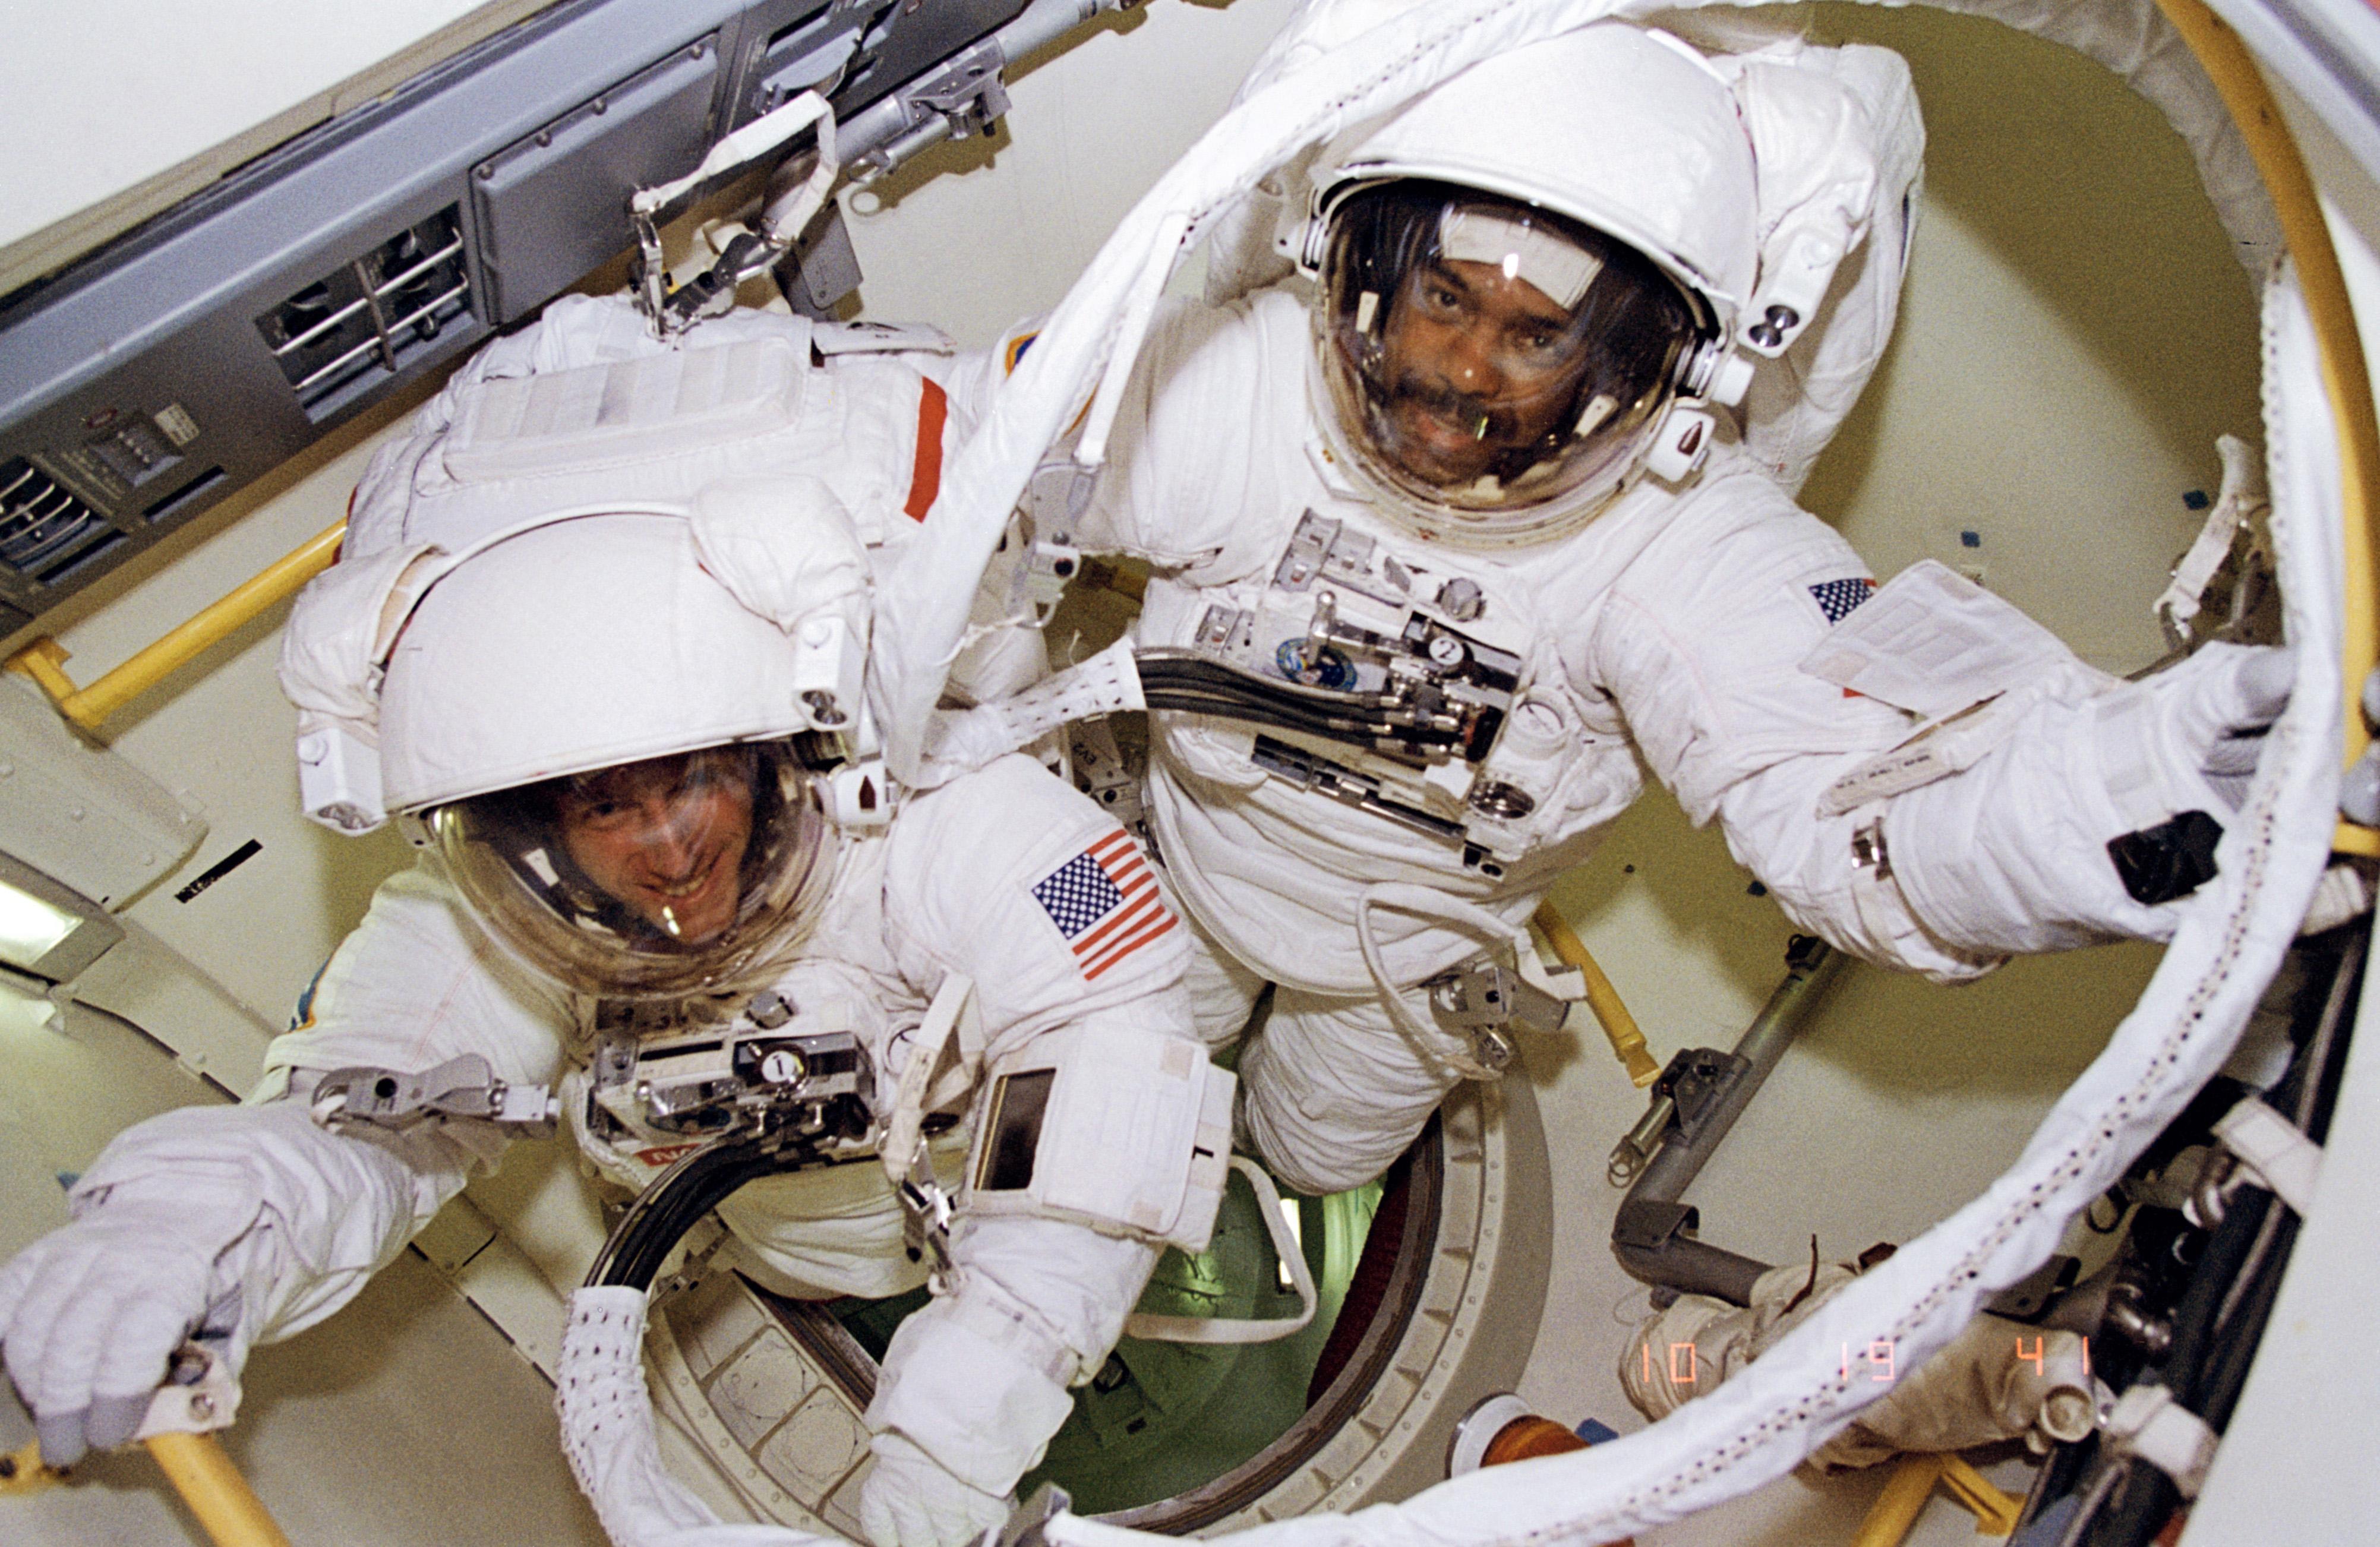 Feb. 9, 1995, Bernard Harris and Michael Foale Ready For a Spacewalk